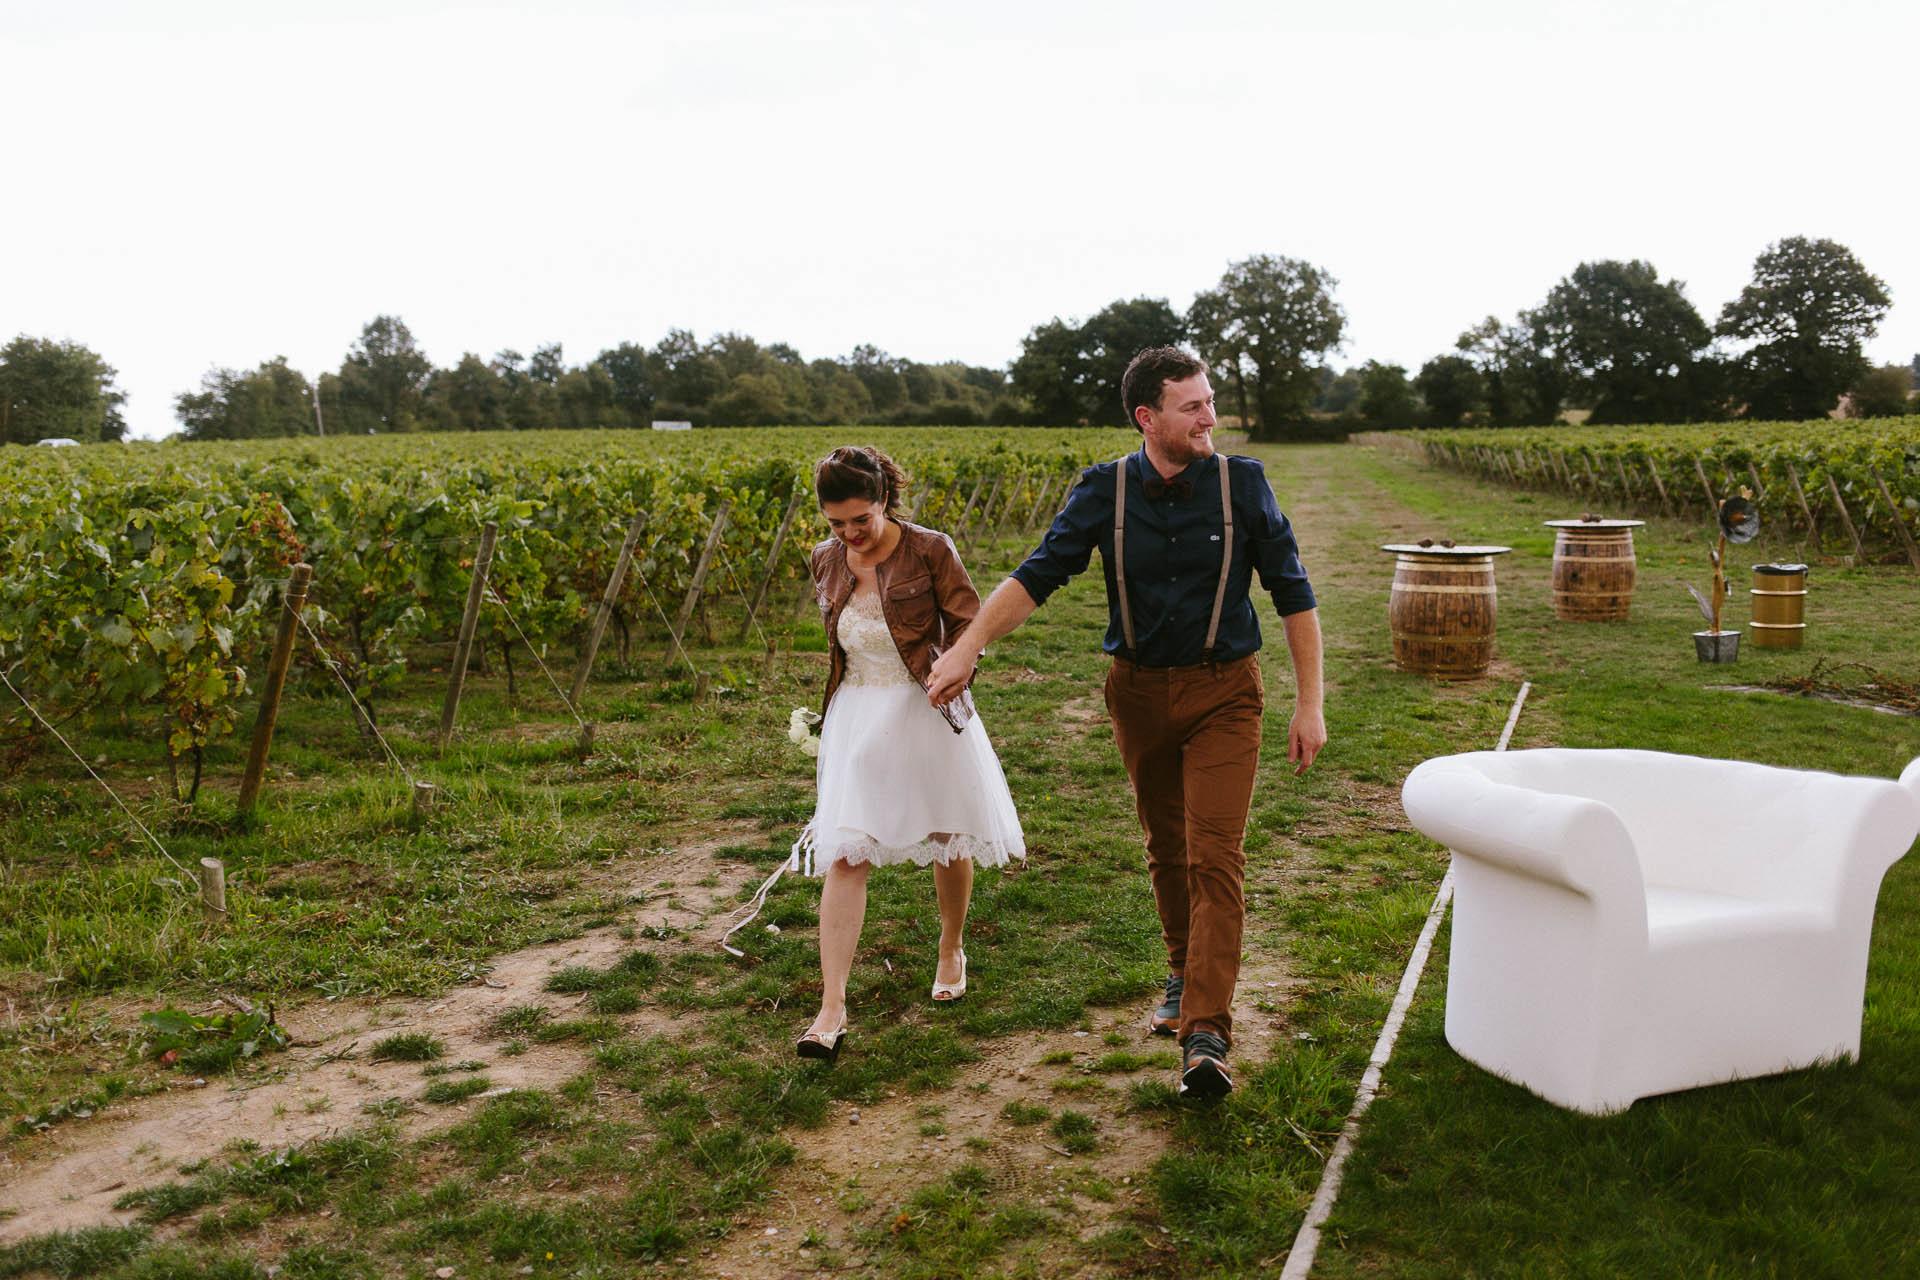 mariage_vignobles_mourat_vendee_jeremy_agathe_flavie_nelly-146